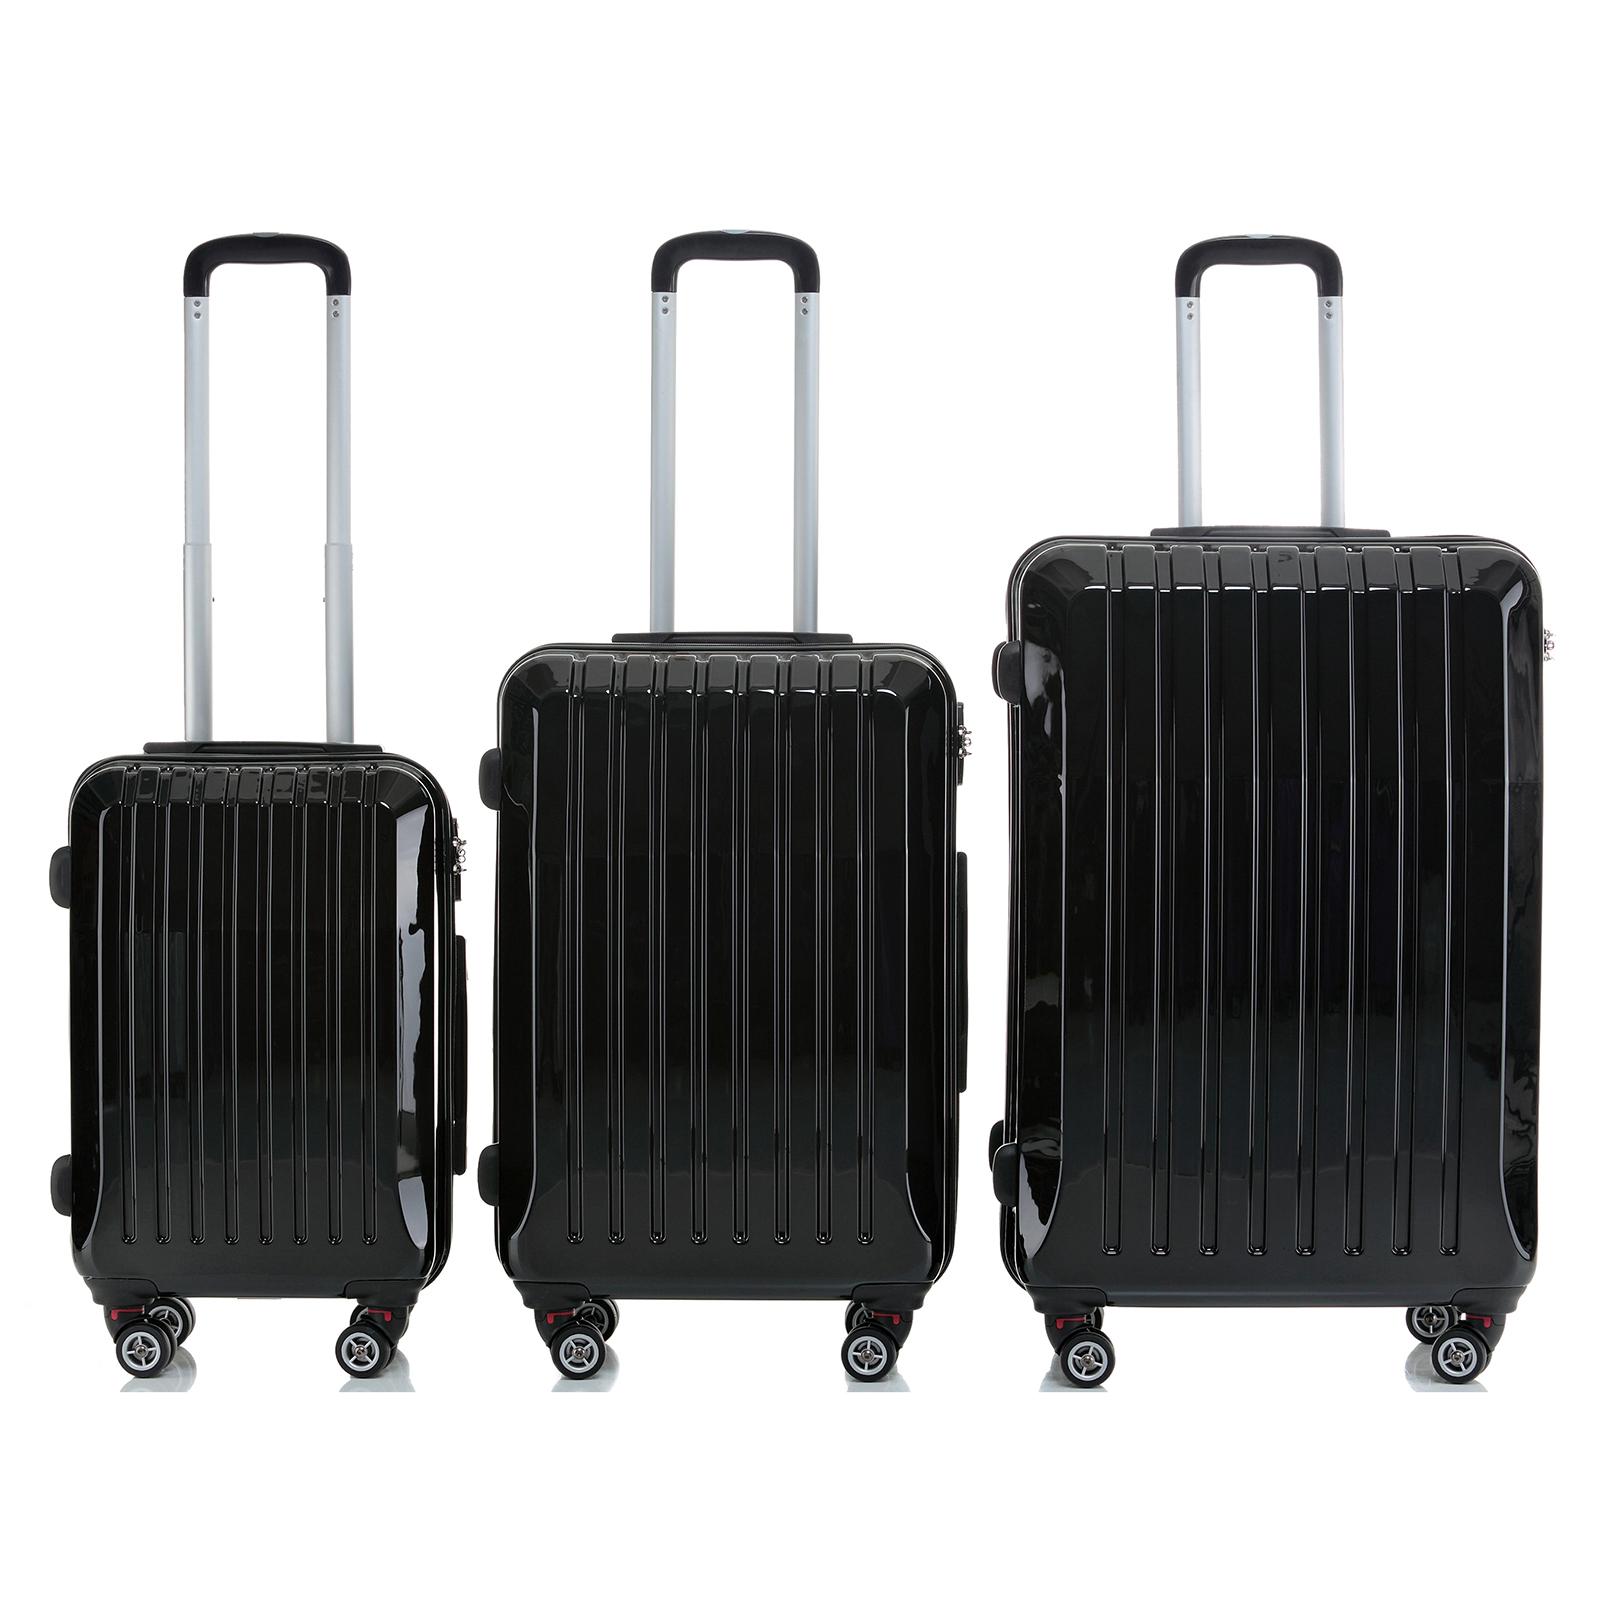 JAM Tourer Hard ABS Case Trolley Luggage Lightweight Baggage ...